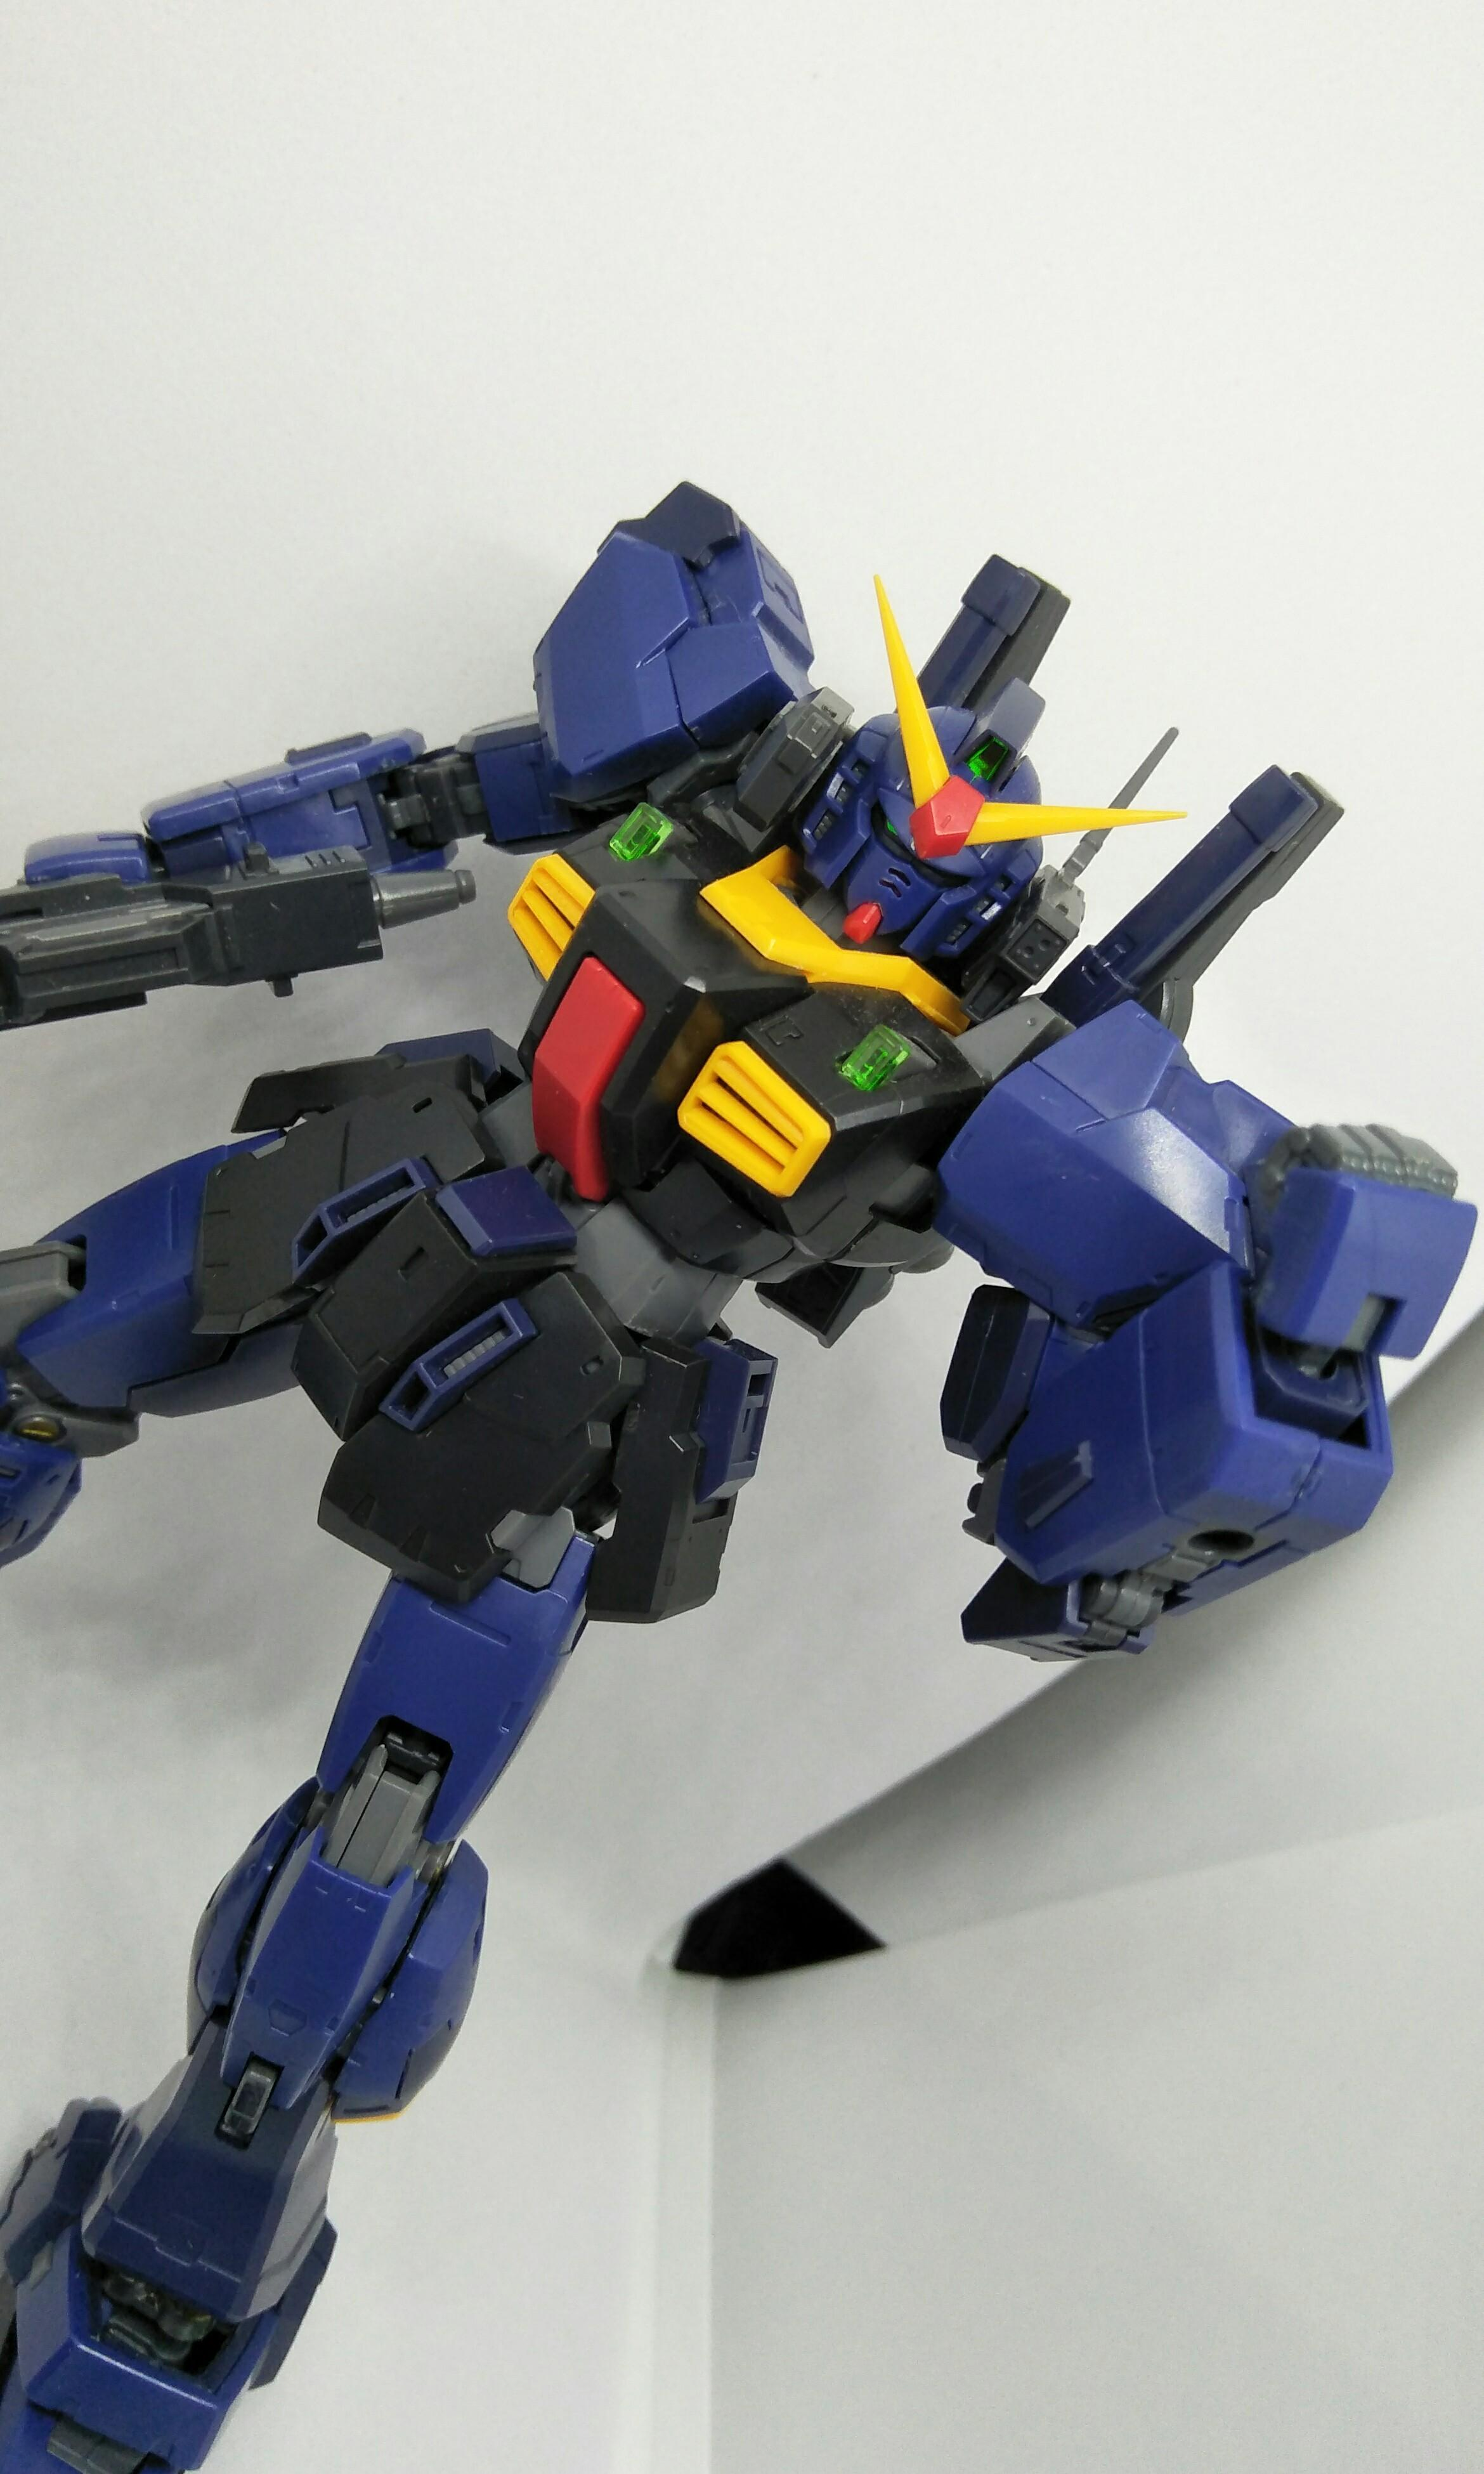 RG Gunpla (Set) + Build Hands